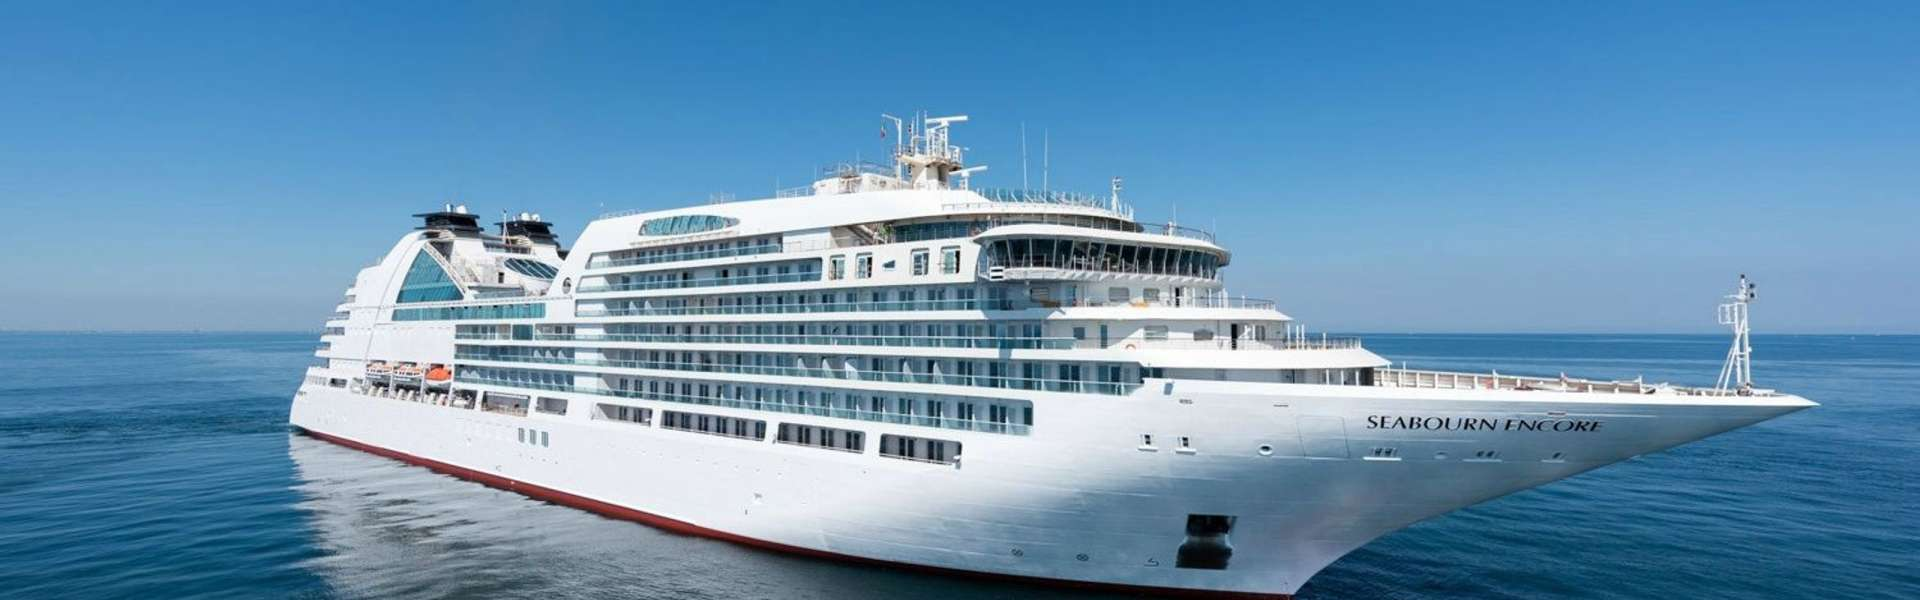 Croaziera 2019 - Mediterana de Est (Atena/Piraeus) - Seabourn - Seabourn Encore -7 nopti